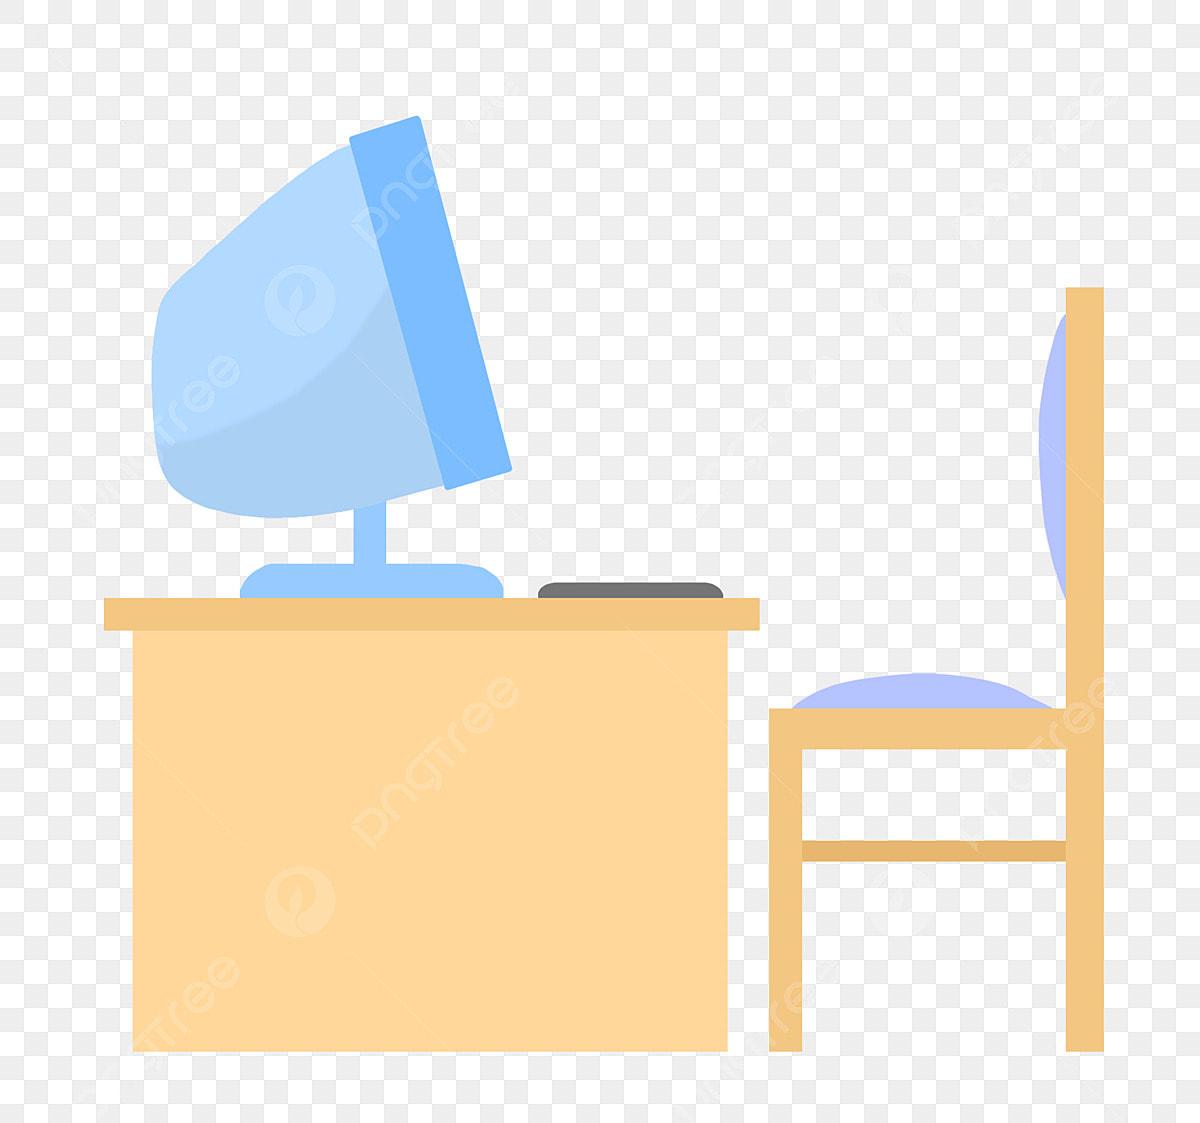 - Computer Desk Stool, Wooden, Table, Computer PNG Transparent